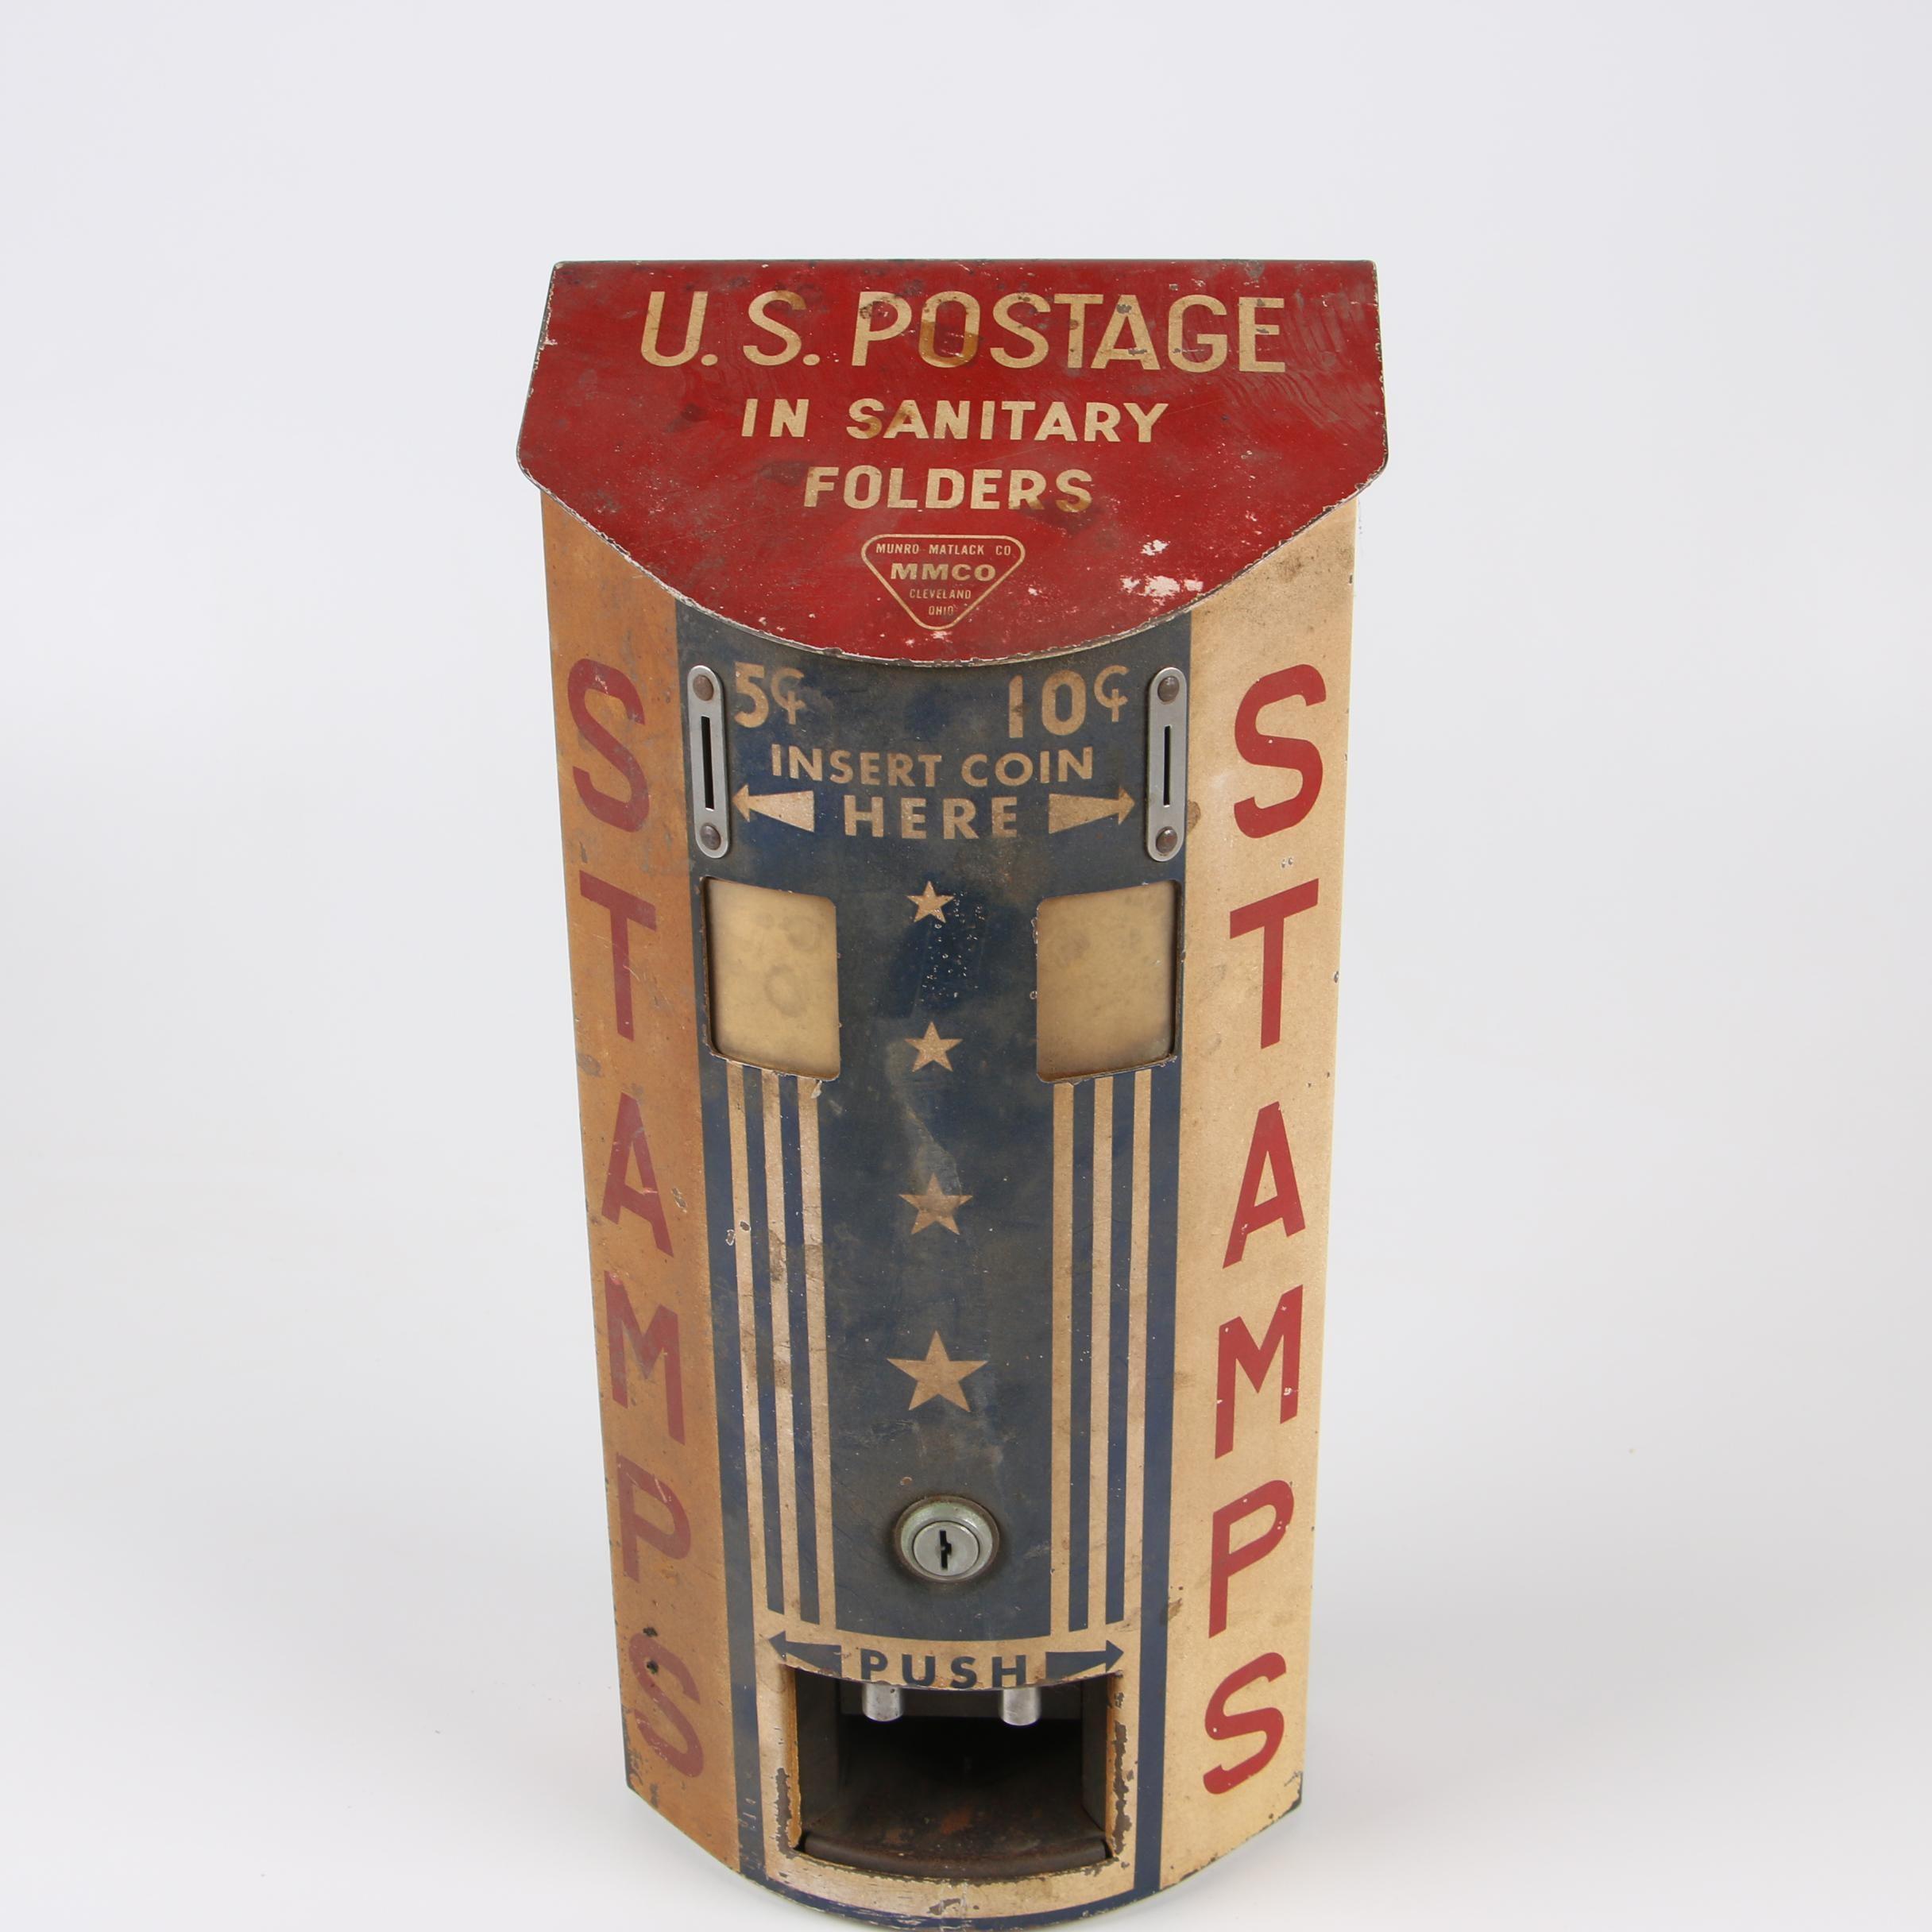 Munro Matlack Co. Sanitary U.S. Postage Stamp Dispenser